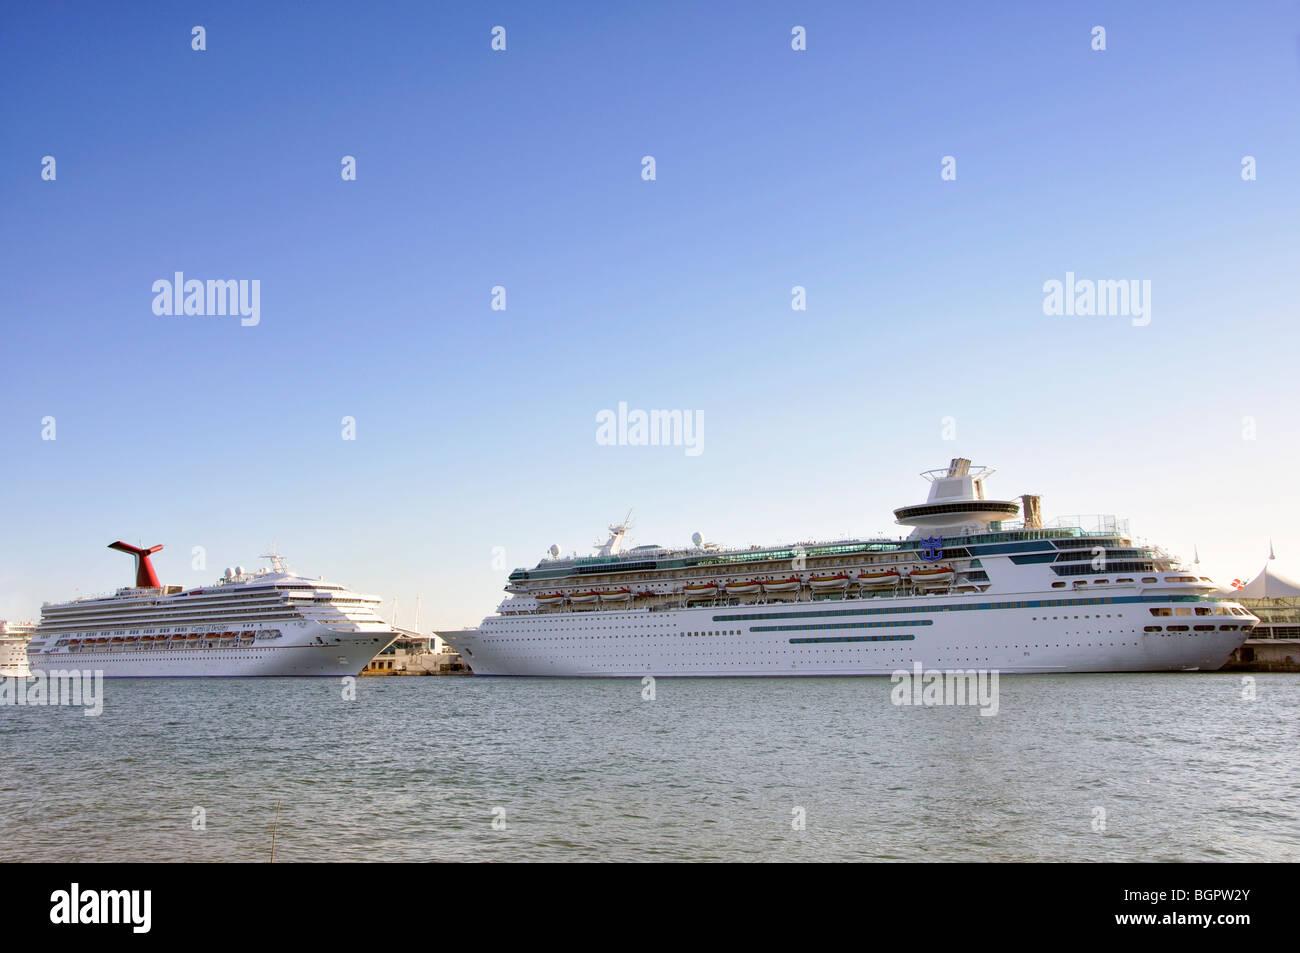 Cruise ships Miami, Florida, USA - Stock Image